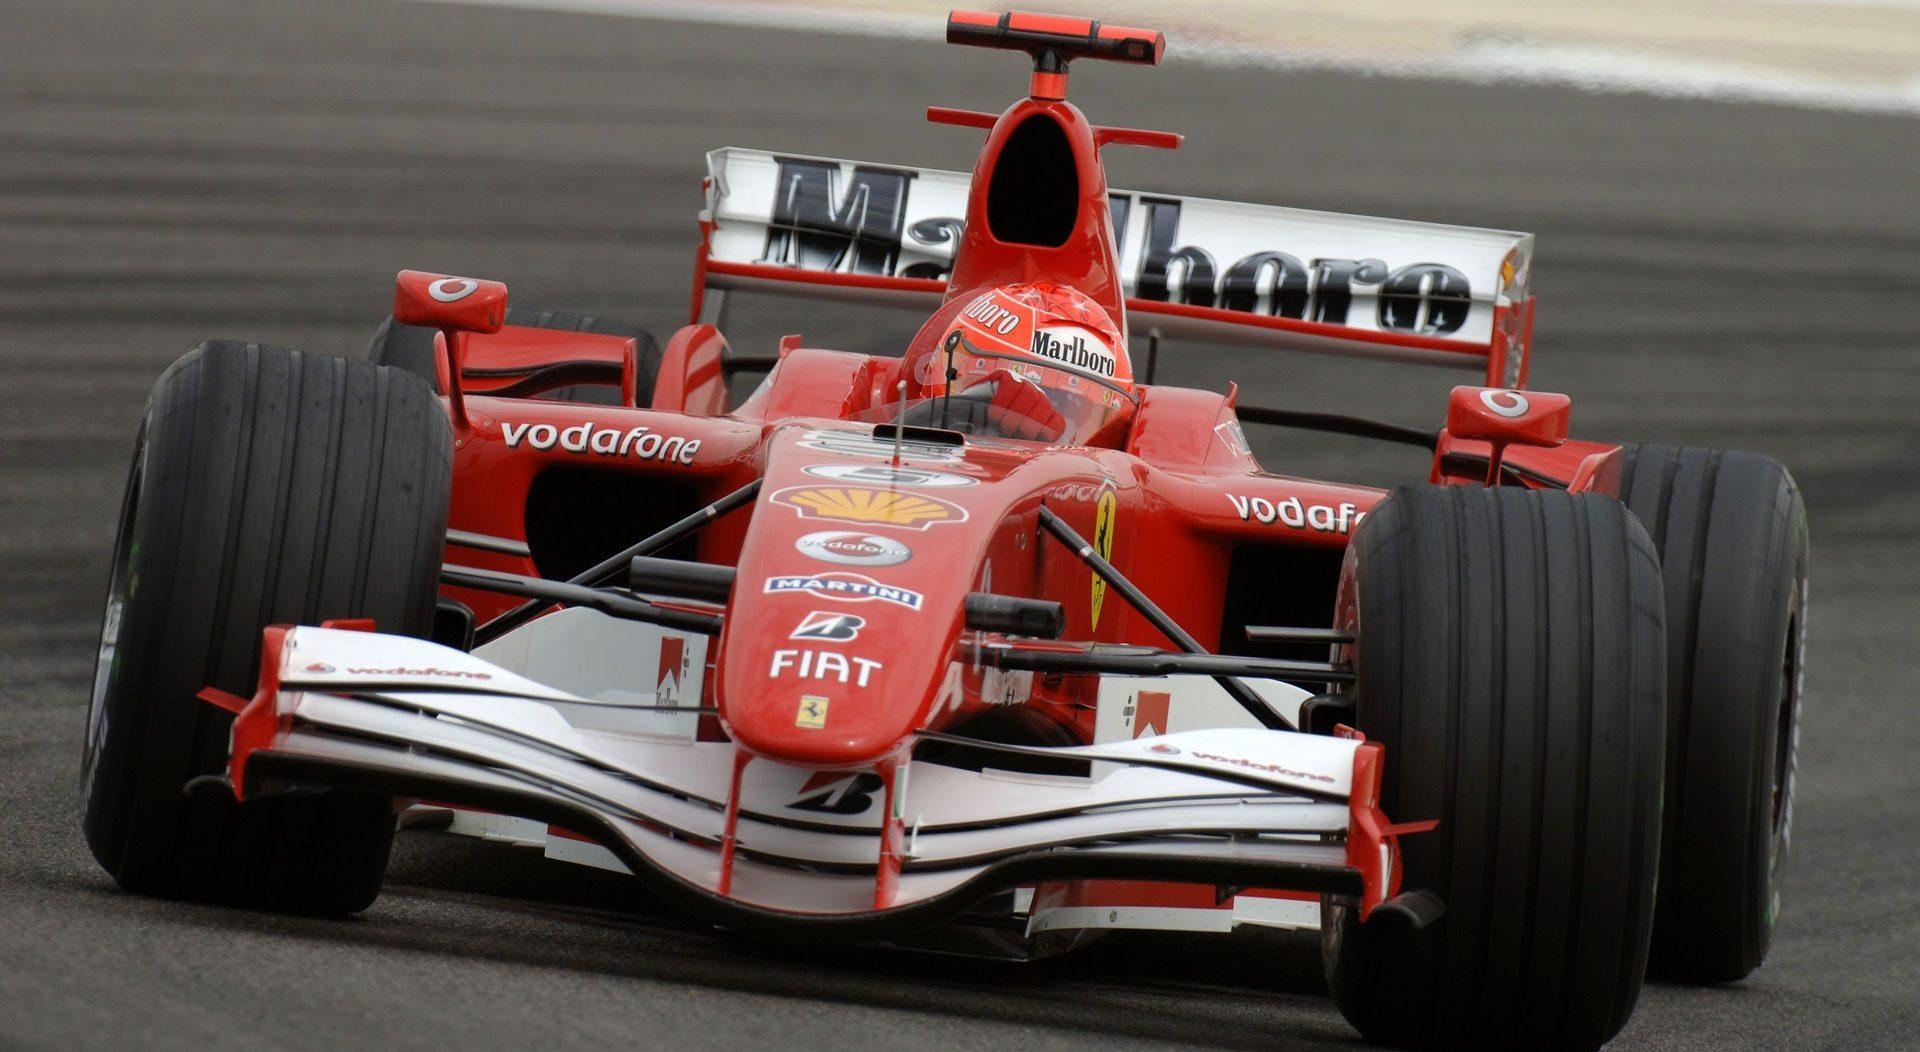 Formula 1 Ferrari F1 Wallpapers Hd Wallpapers